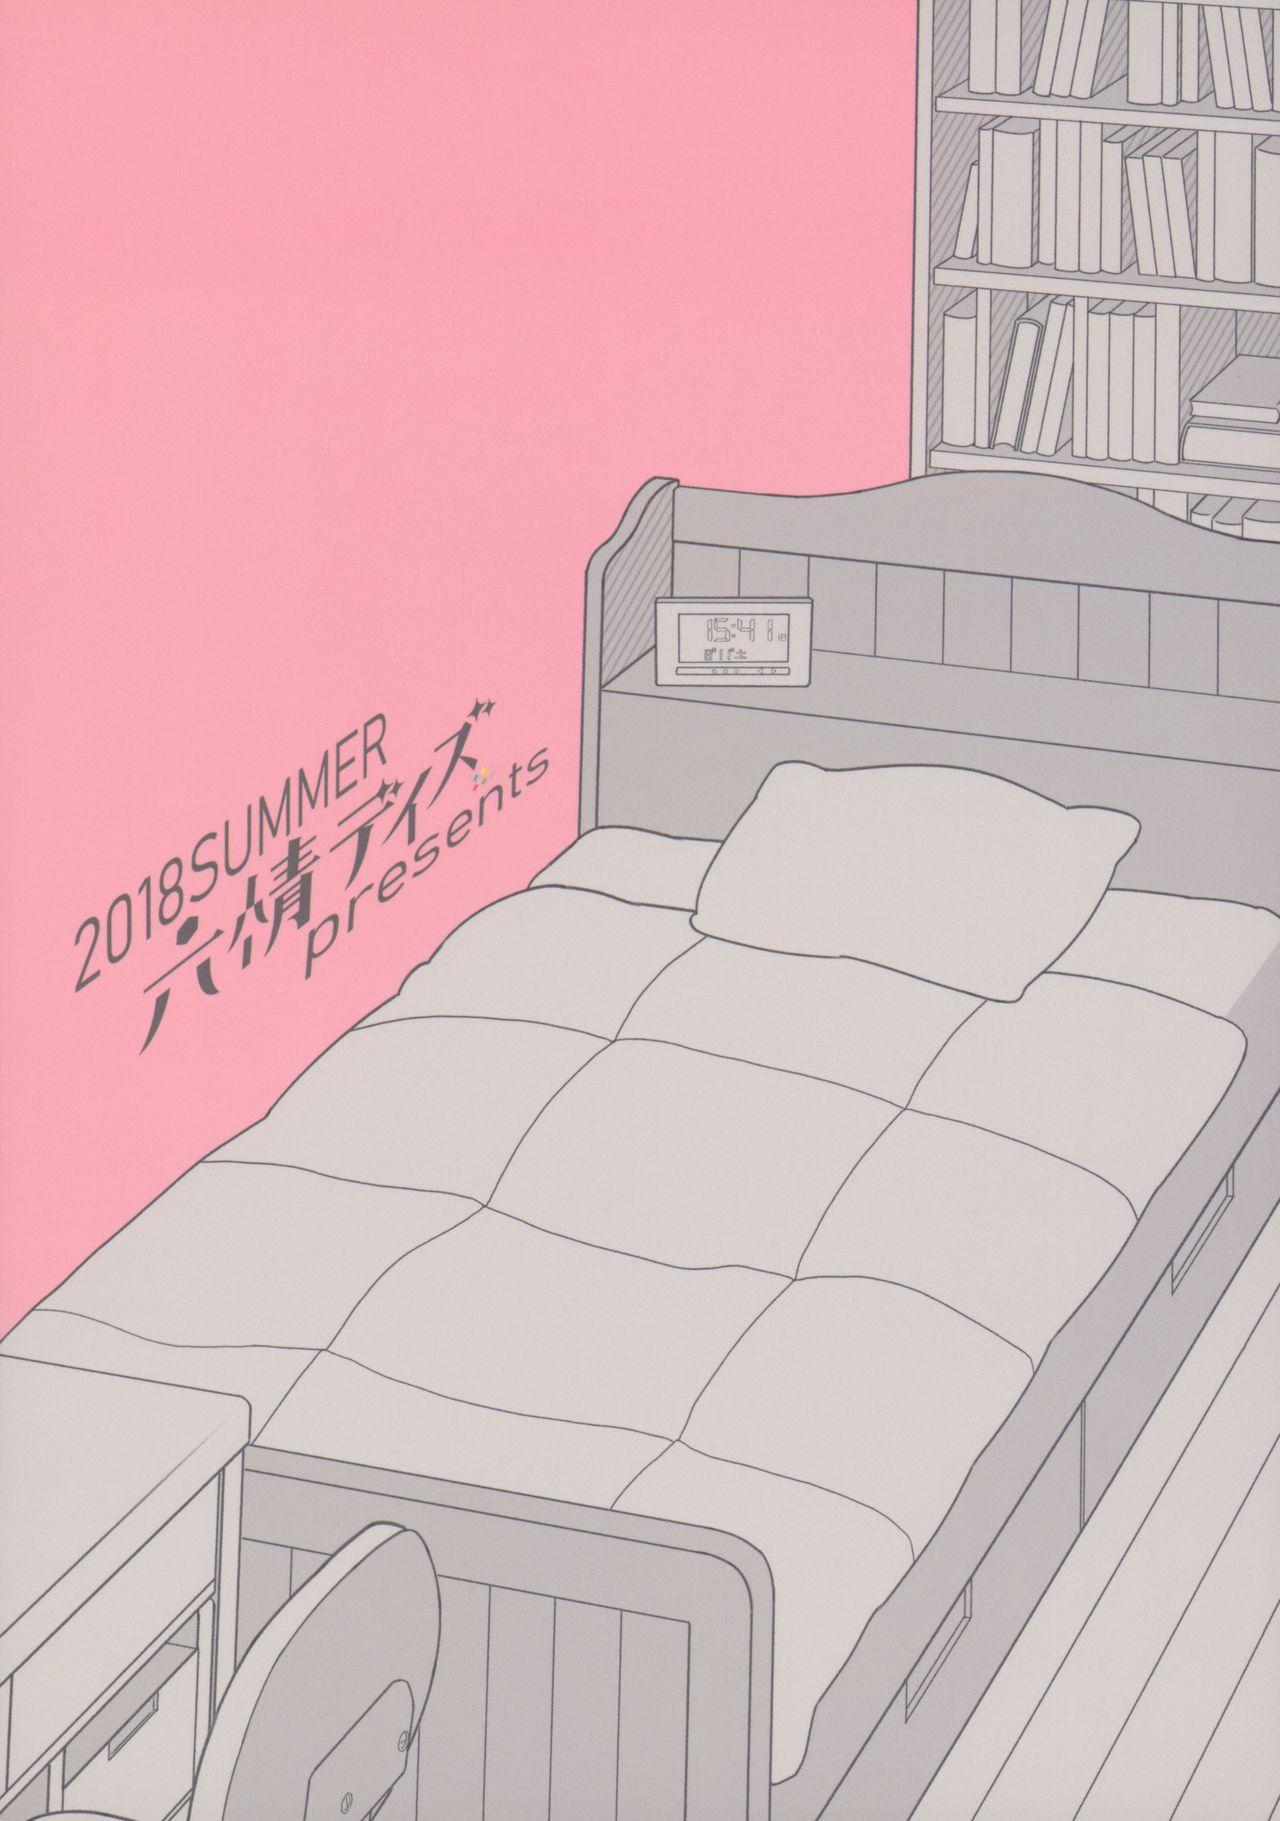 Tomodachi to Suru no wa Warui Koto? | Is it wrong to have sex with my friend? 17